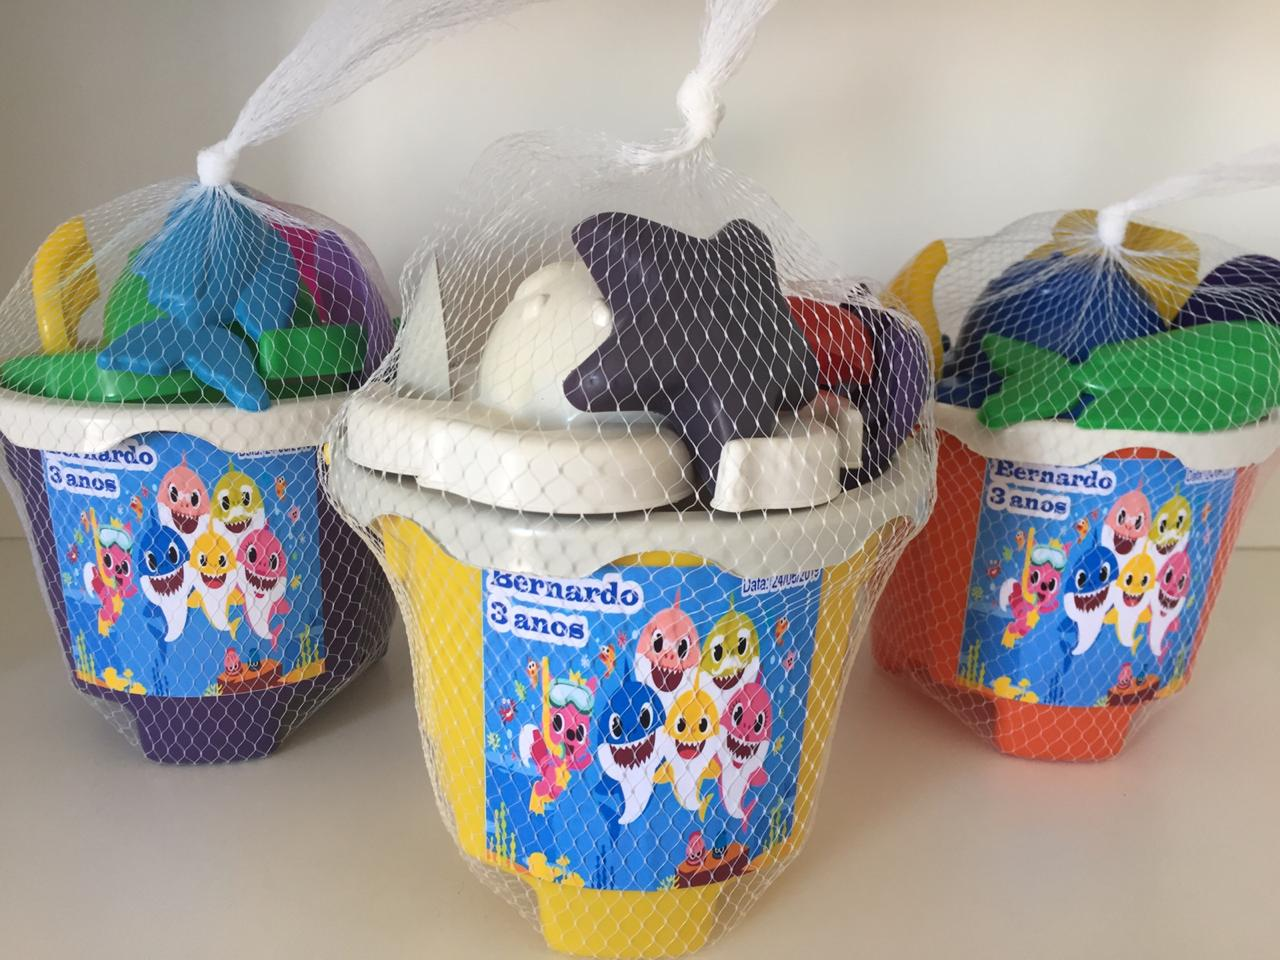 Kit com 10 baldes de praia Baby Shark